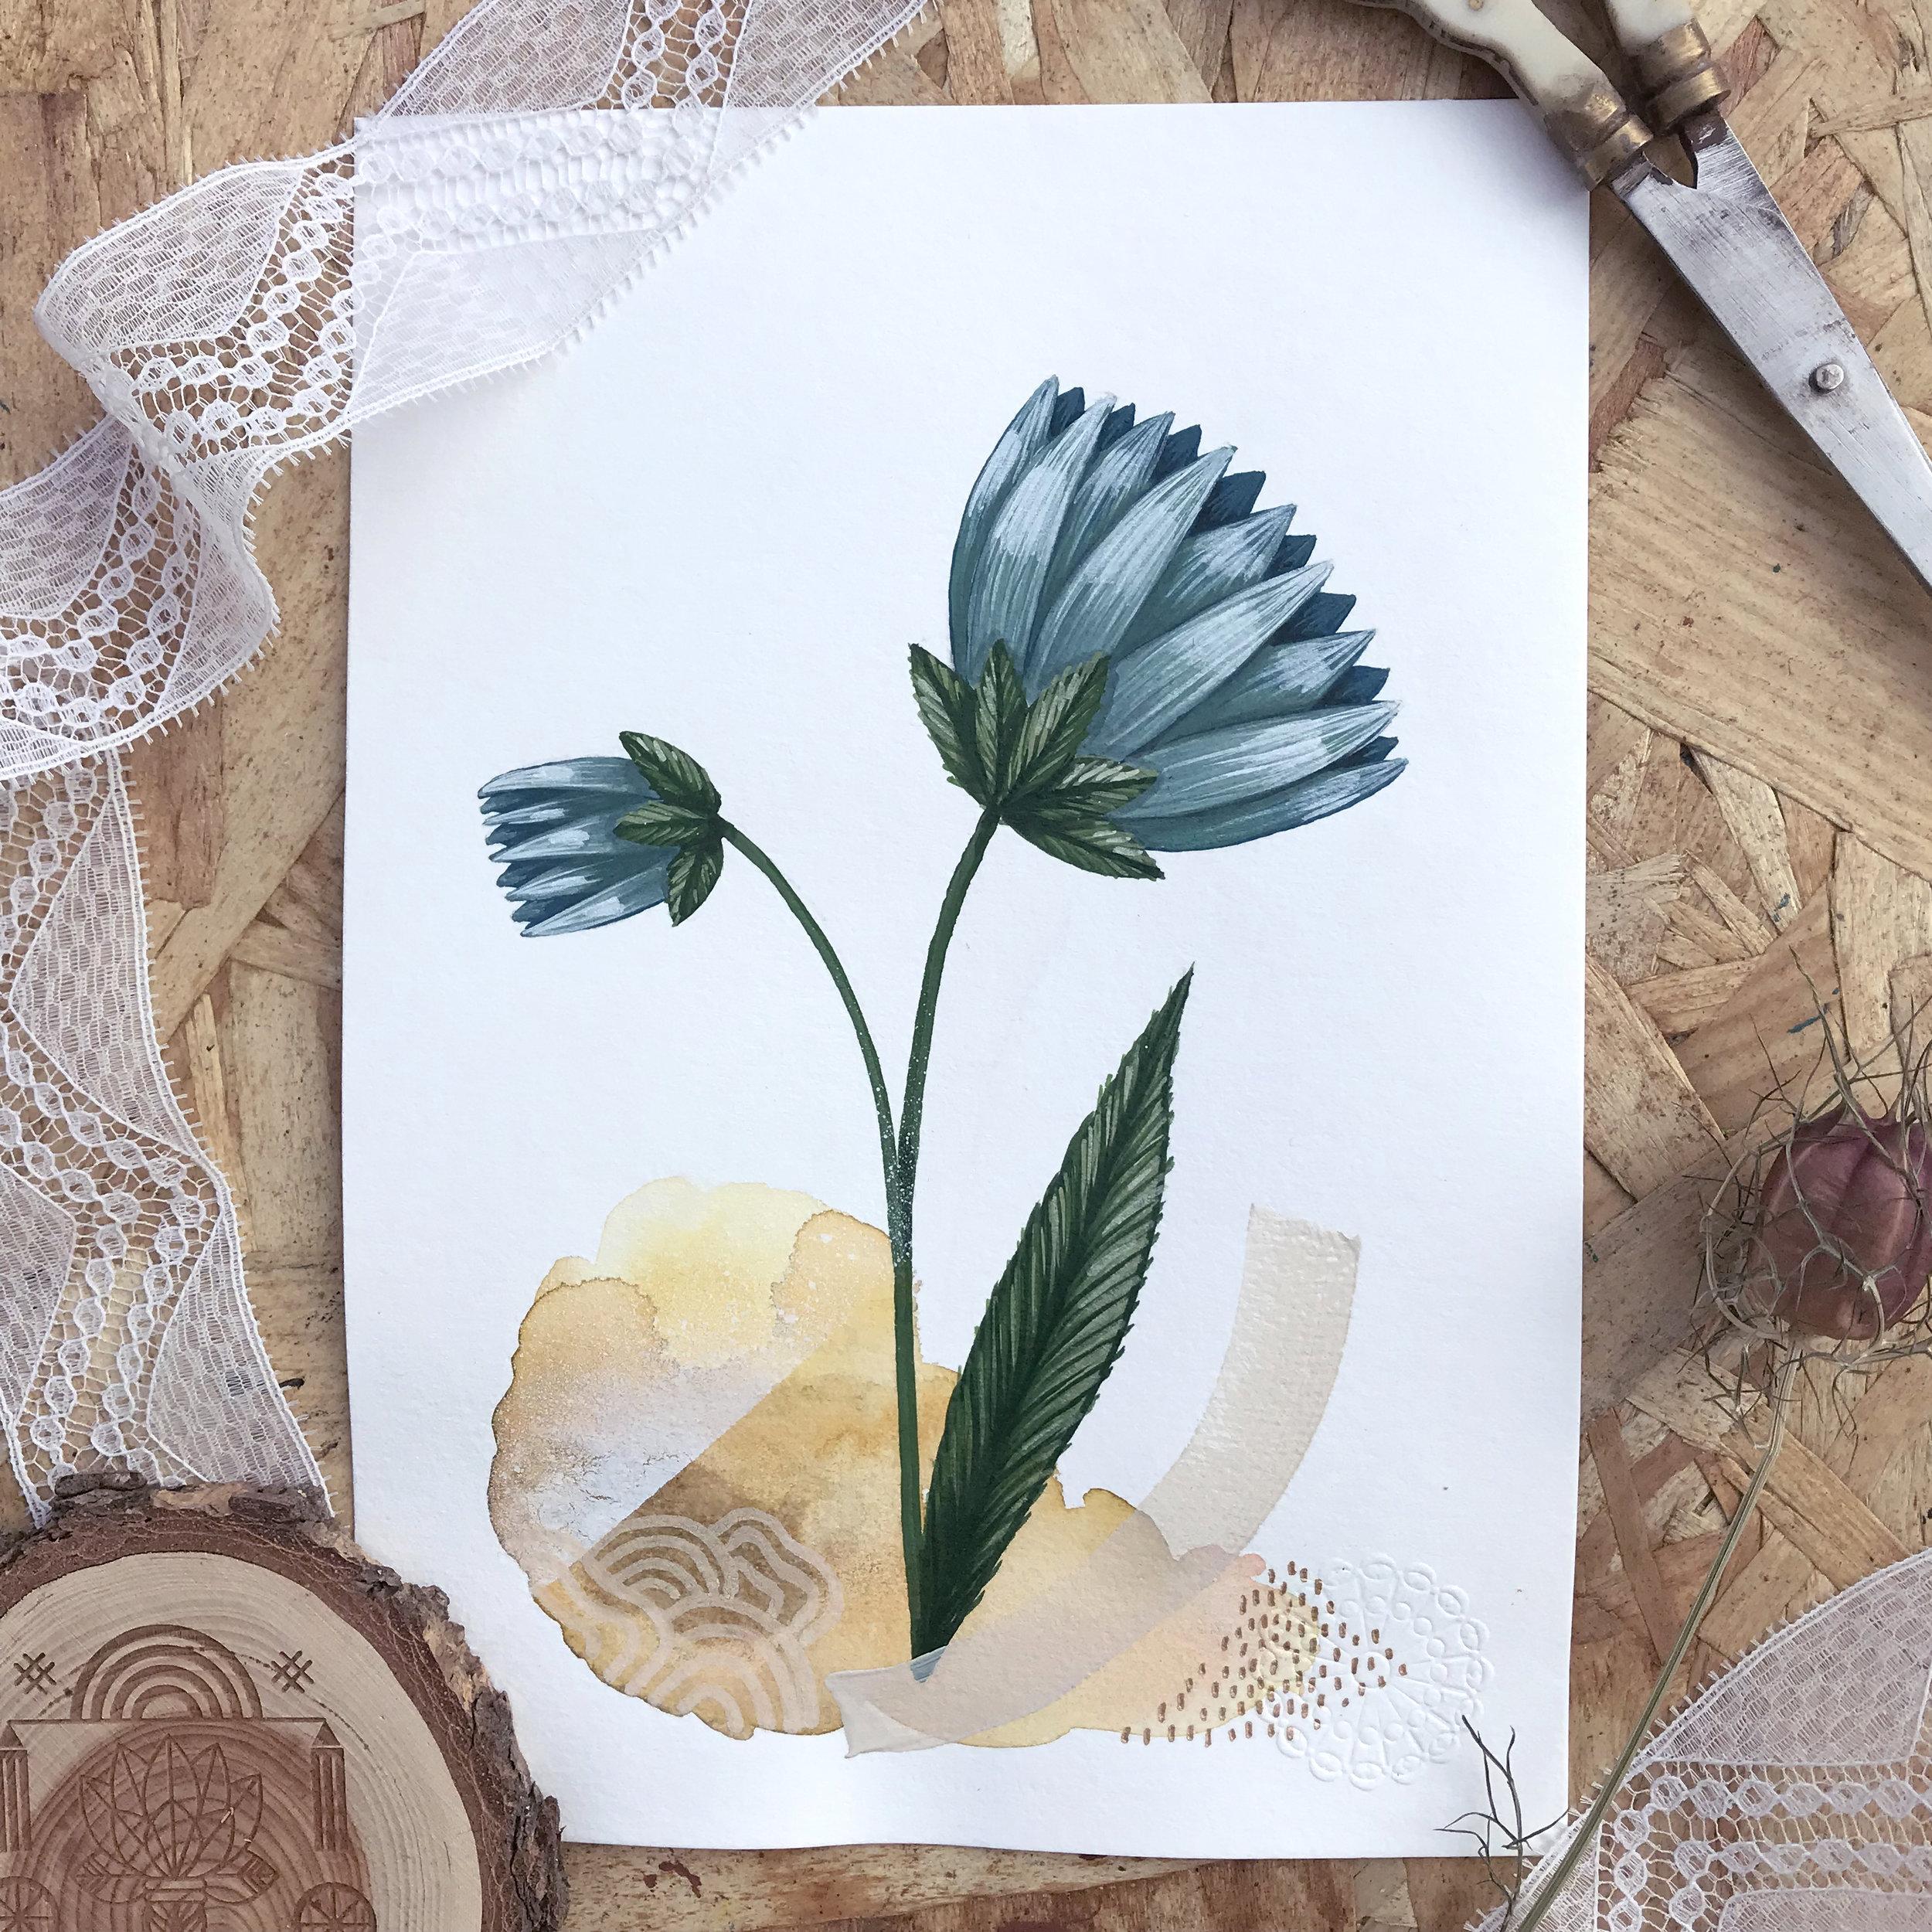 Haslum Iris  from Botanic garden, Herbarium - Mix media   2018